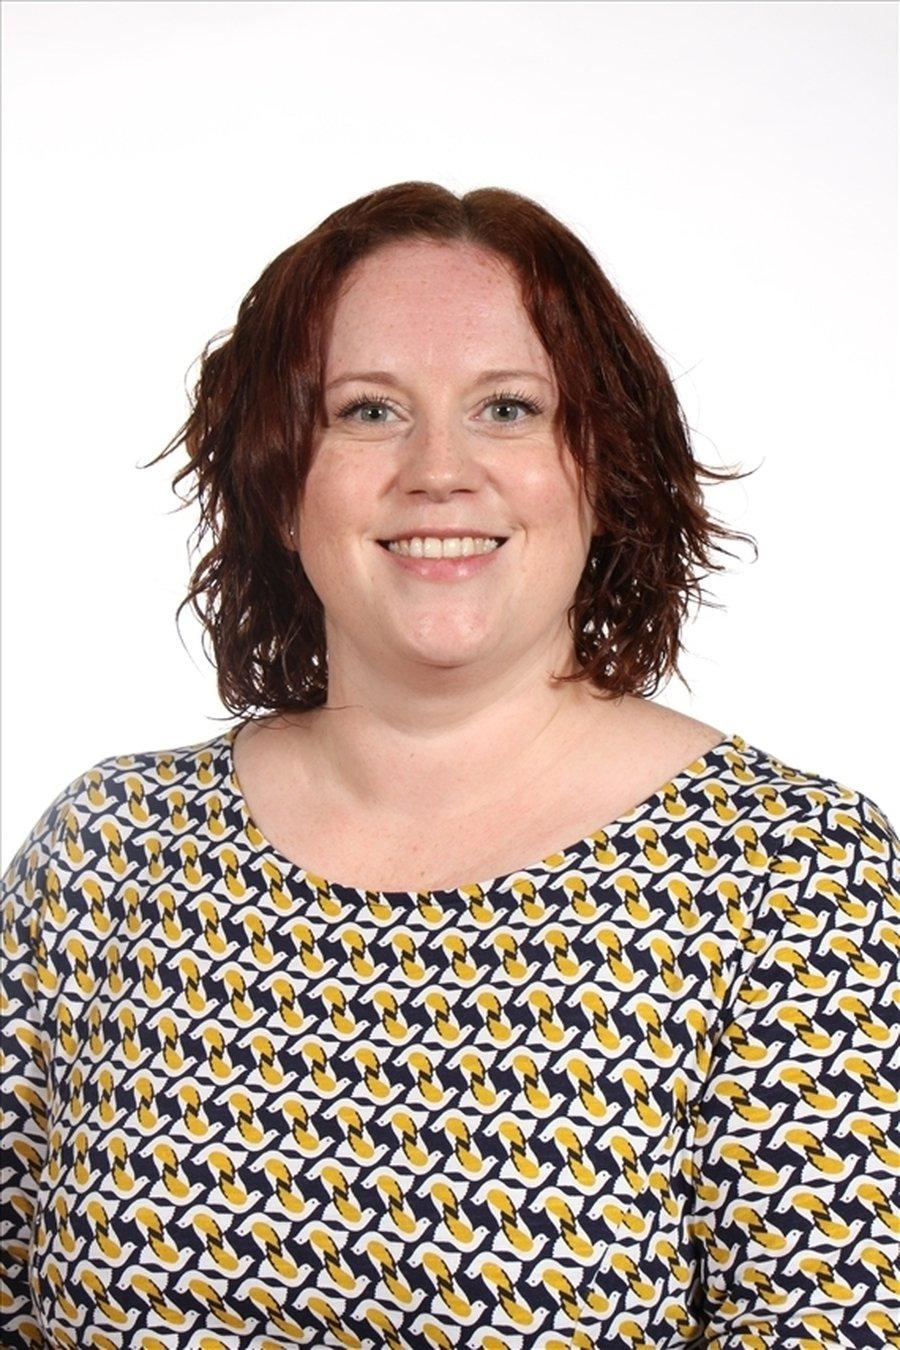 Mrs Twycross - Deputy Head Teacher & Deputy Designated Safeguarding Lead